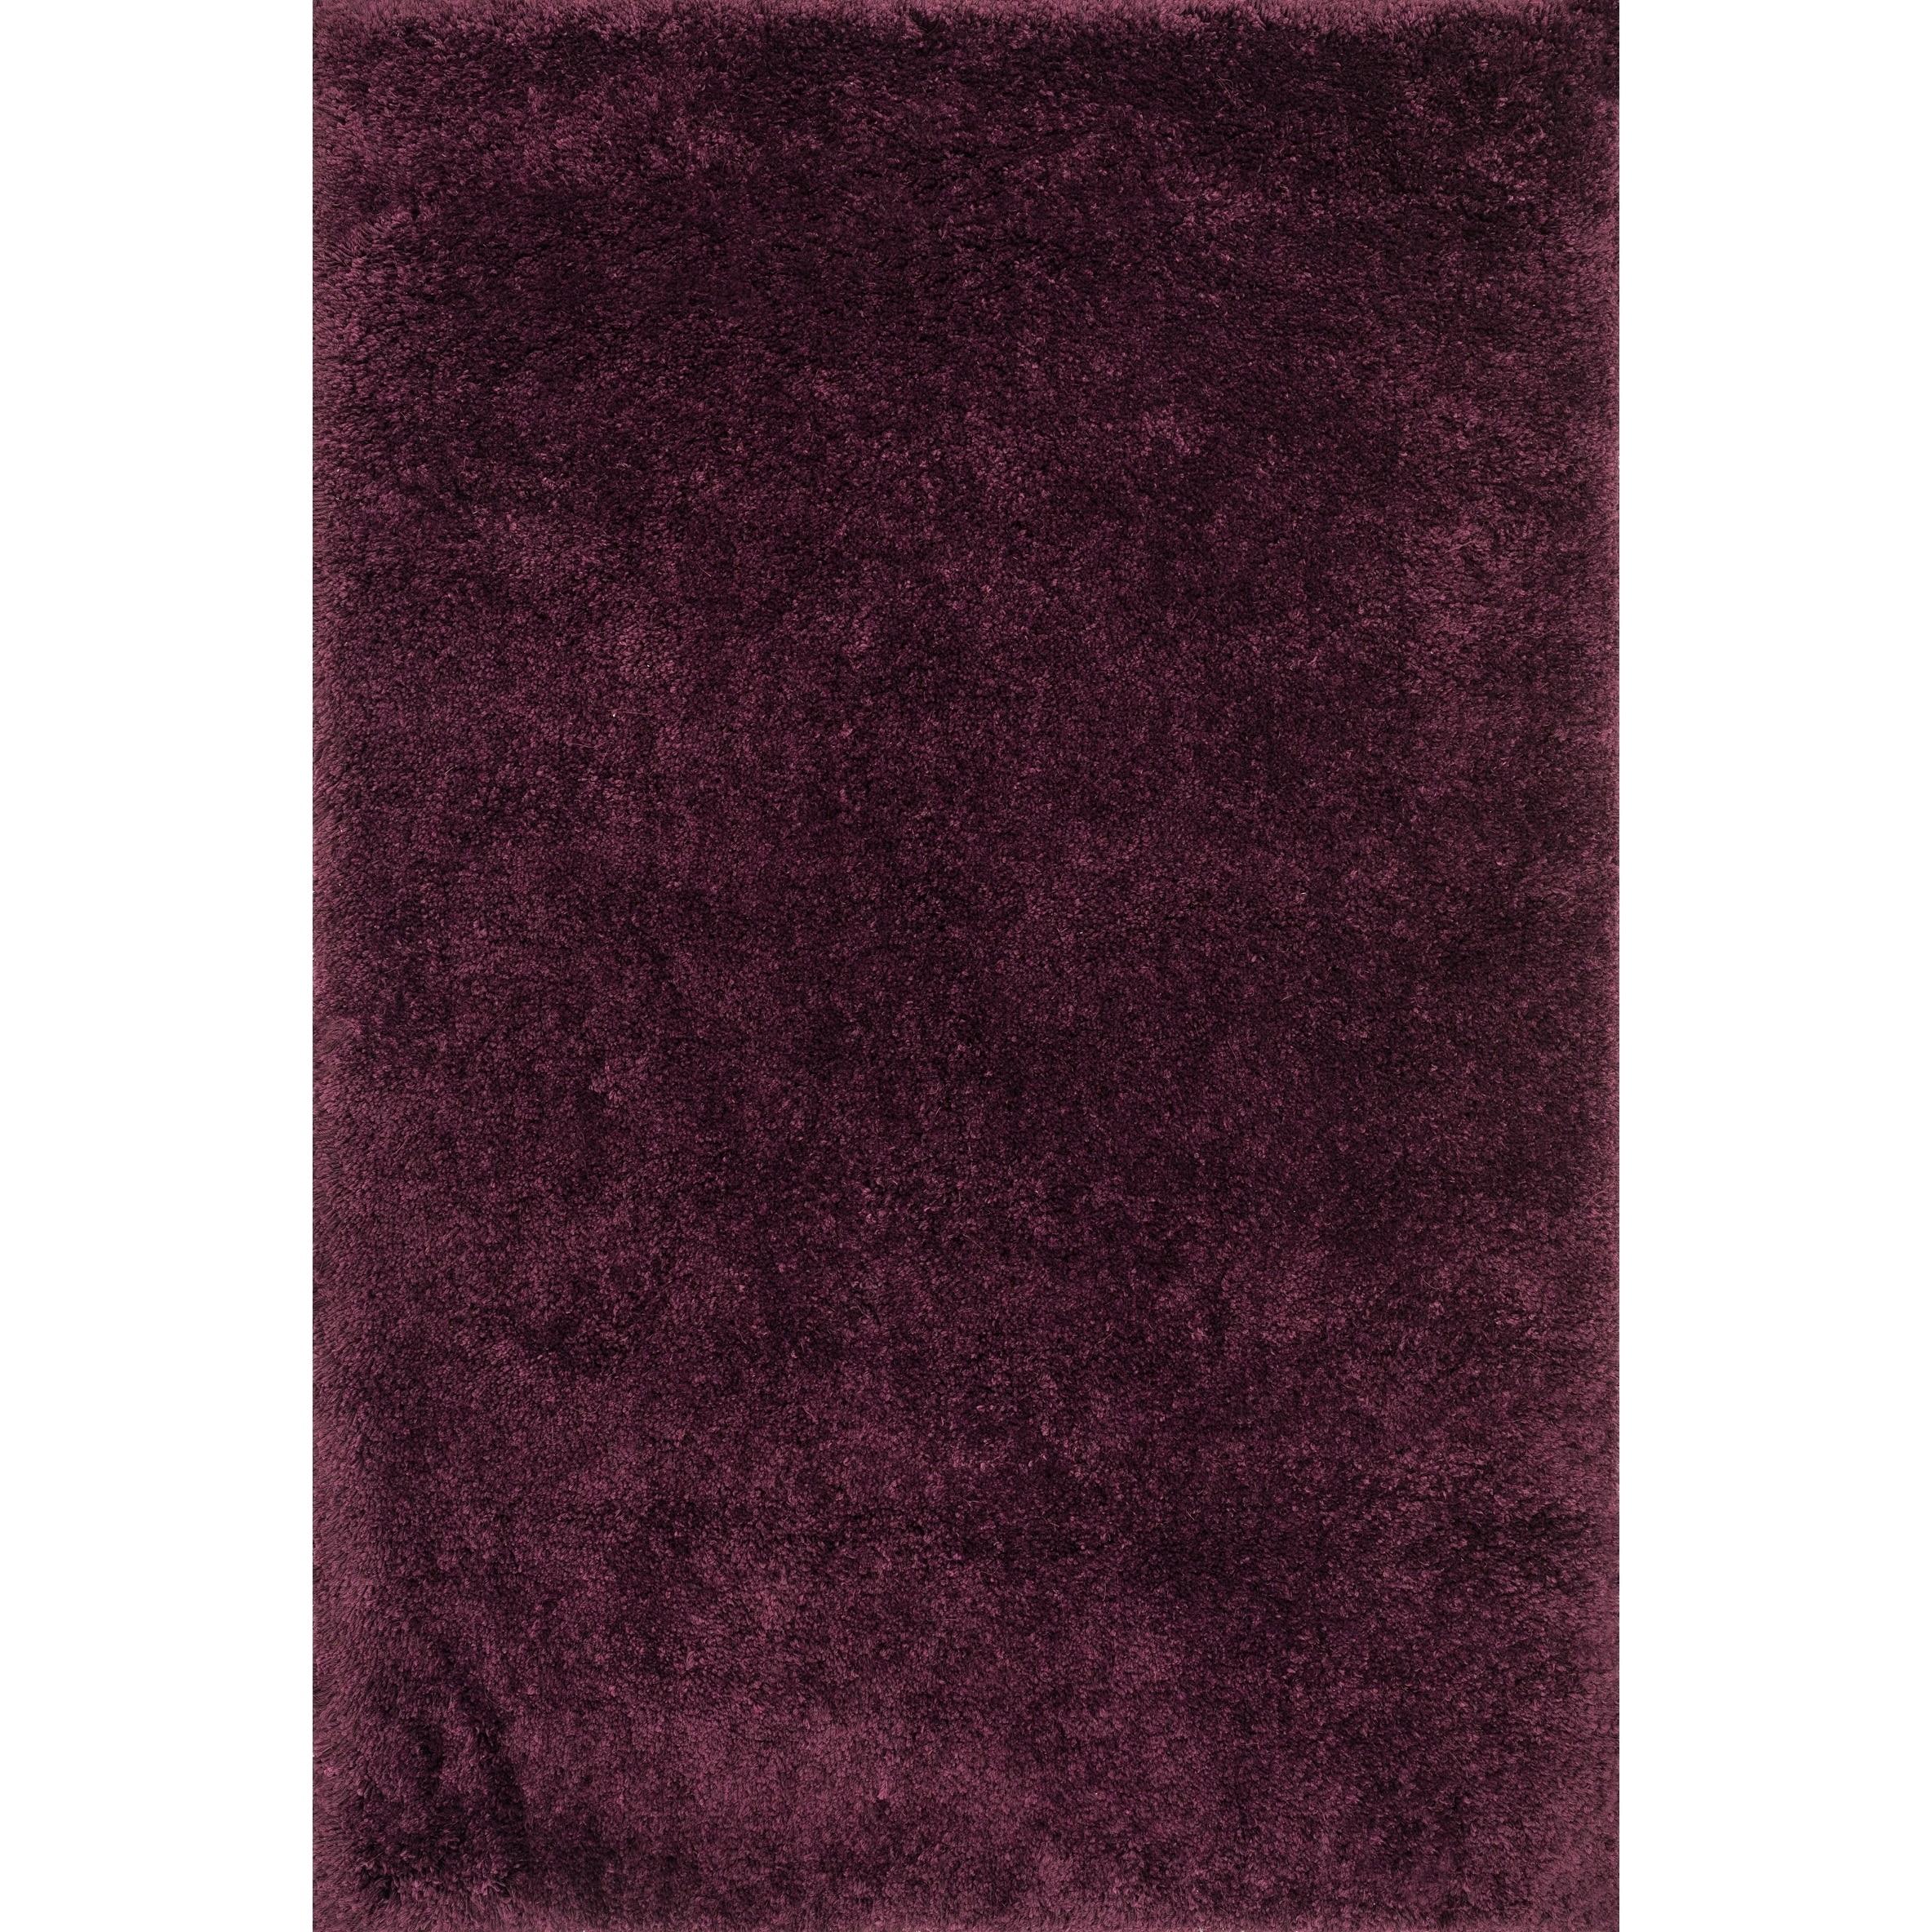 Alexander Home Plush Contemporary Burgundy/Purple Shag Area Rug - 93 x 13 (Prune - 93 x 13)